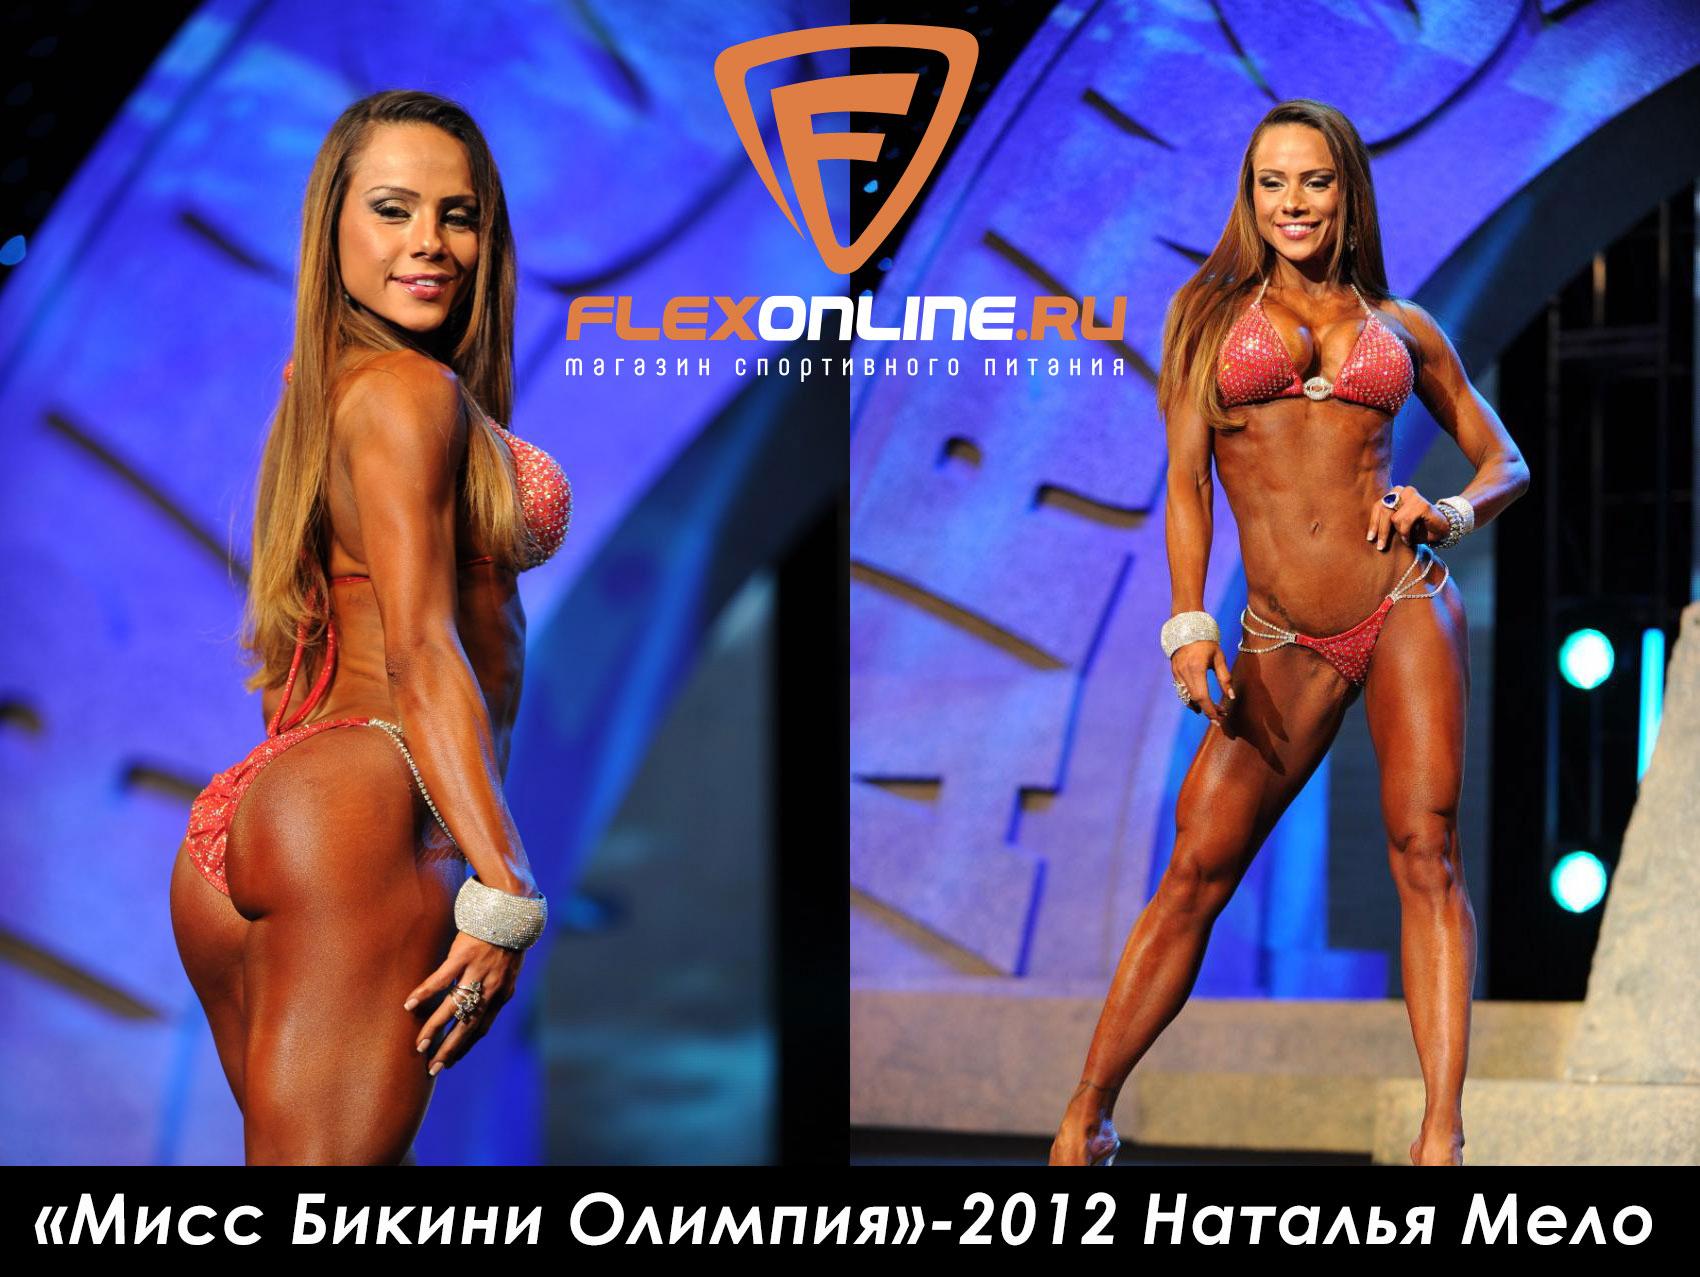 «Мисс Бикини Олимпия»-2012 Наталья Мело